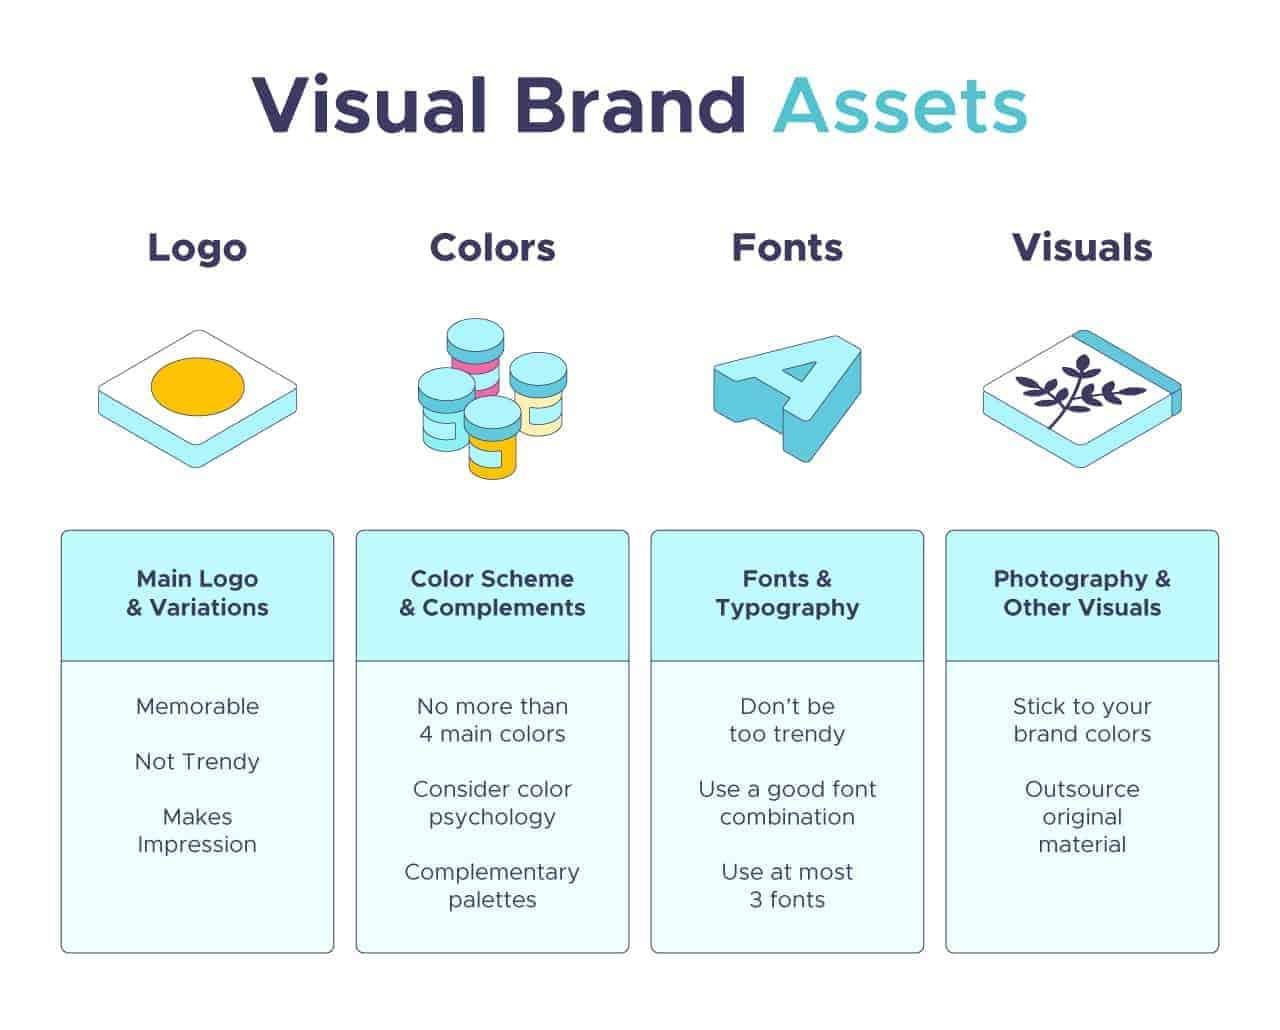 visual-brand-assets-8783481